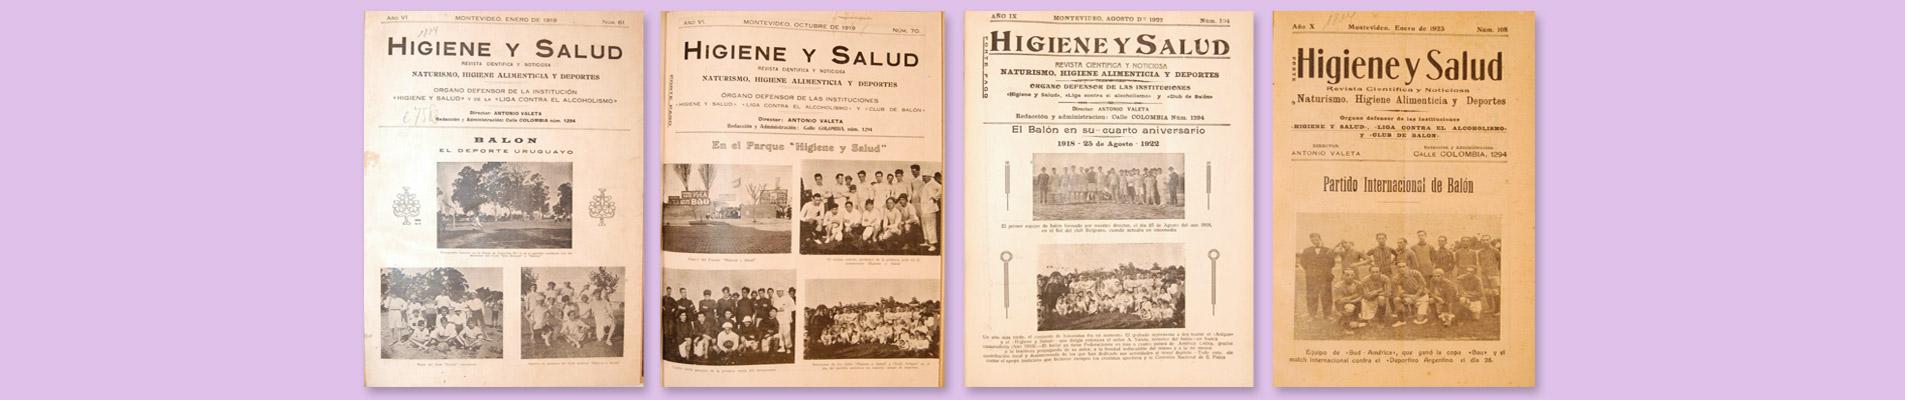 balonmano-banner-1920-4